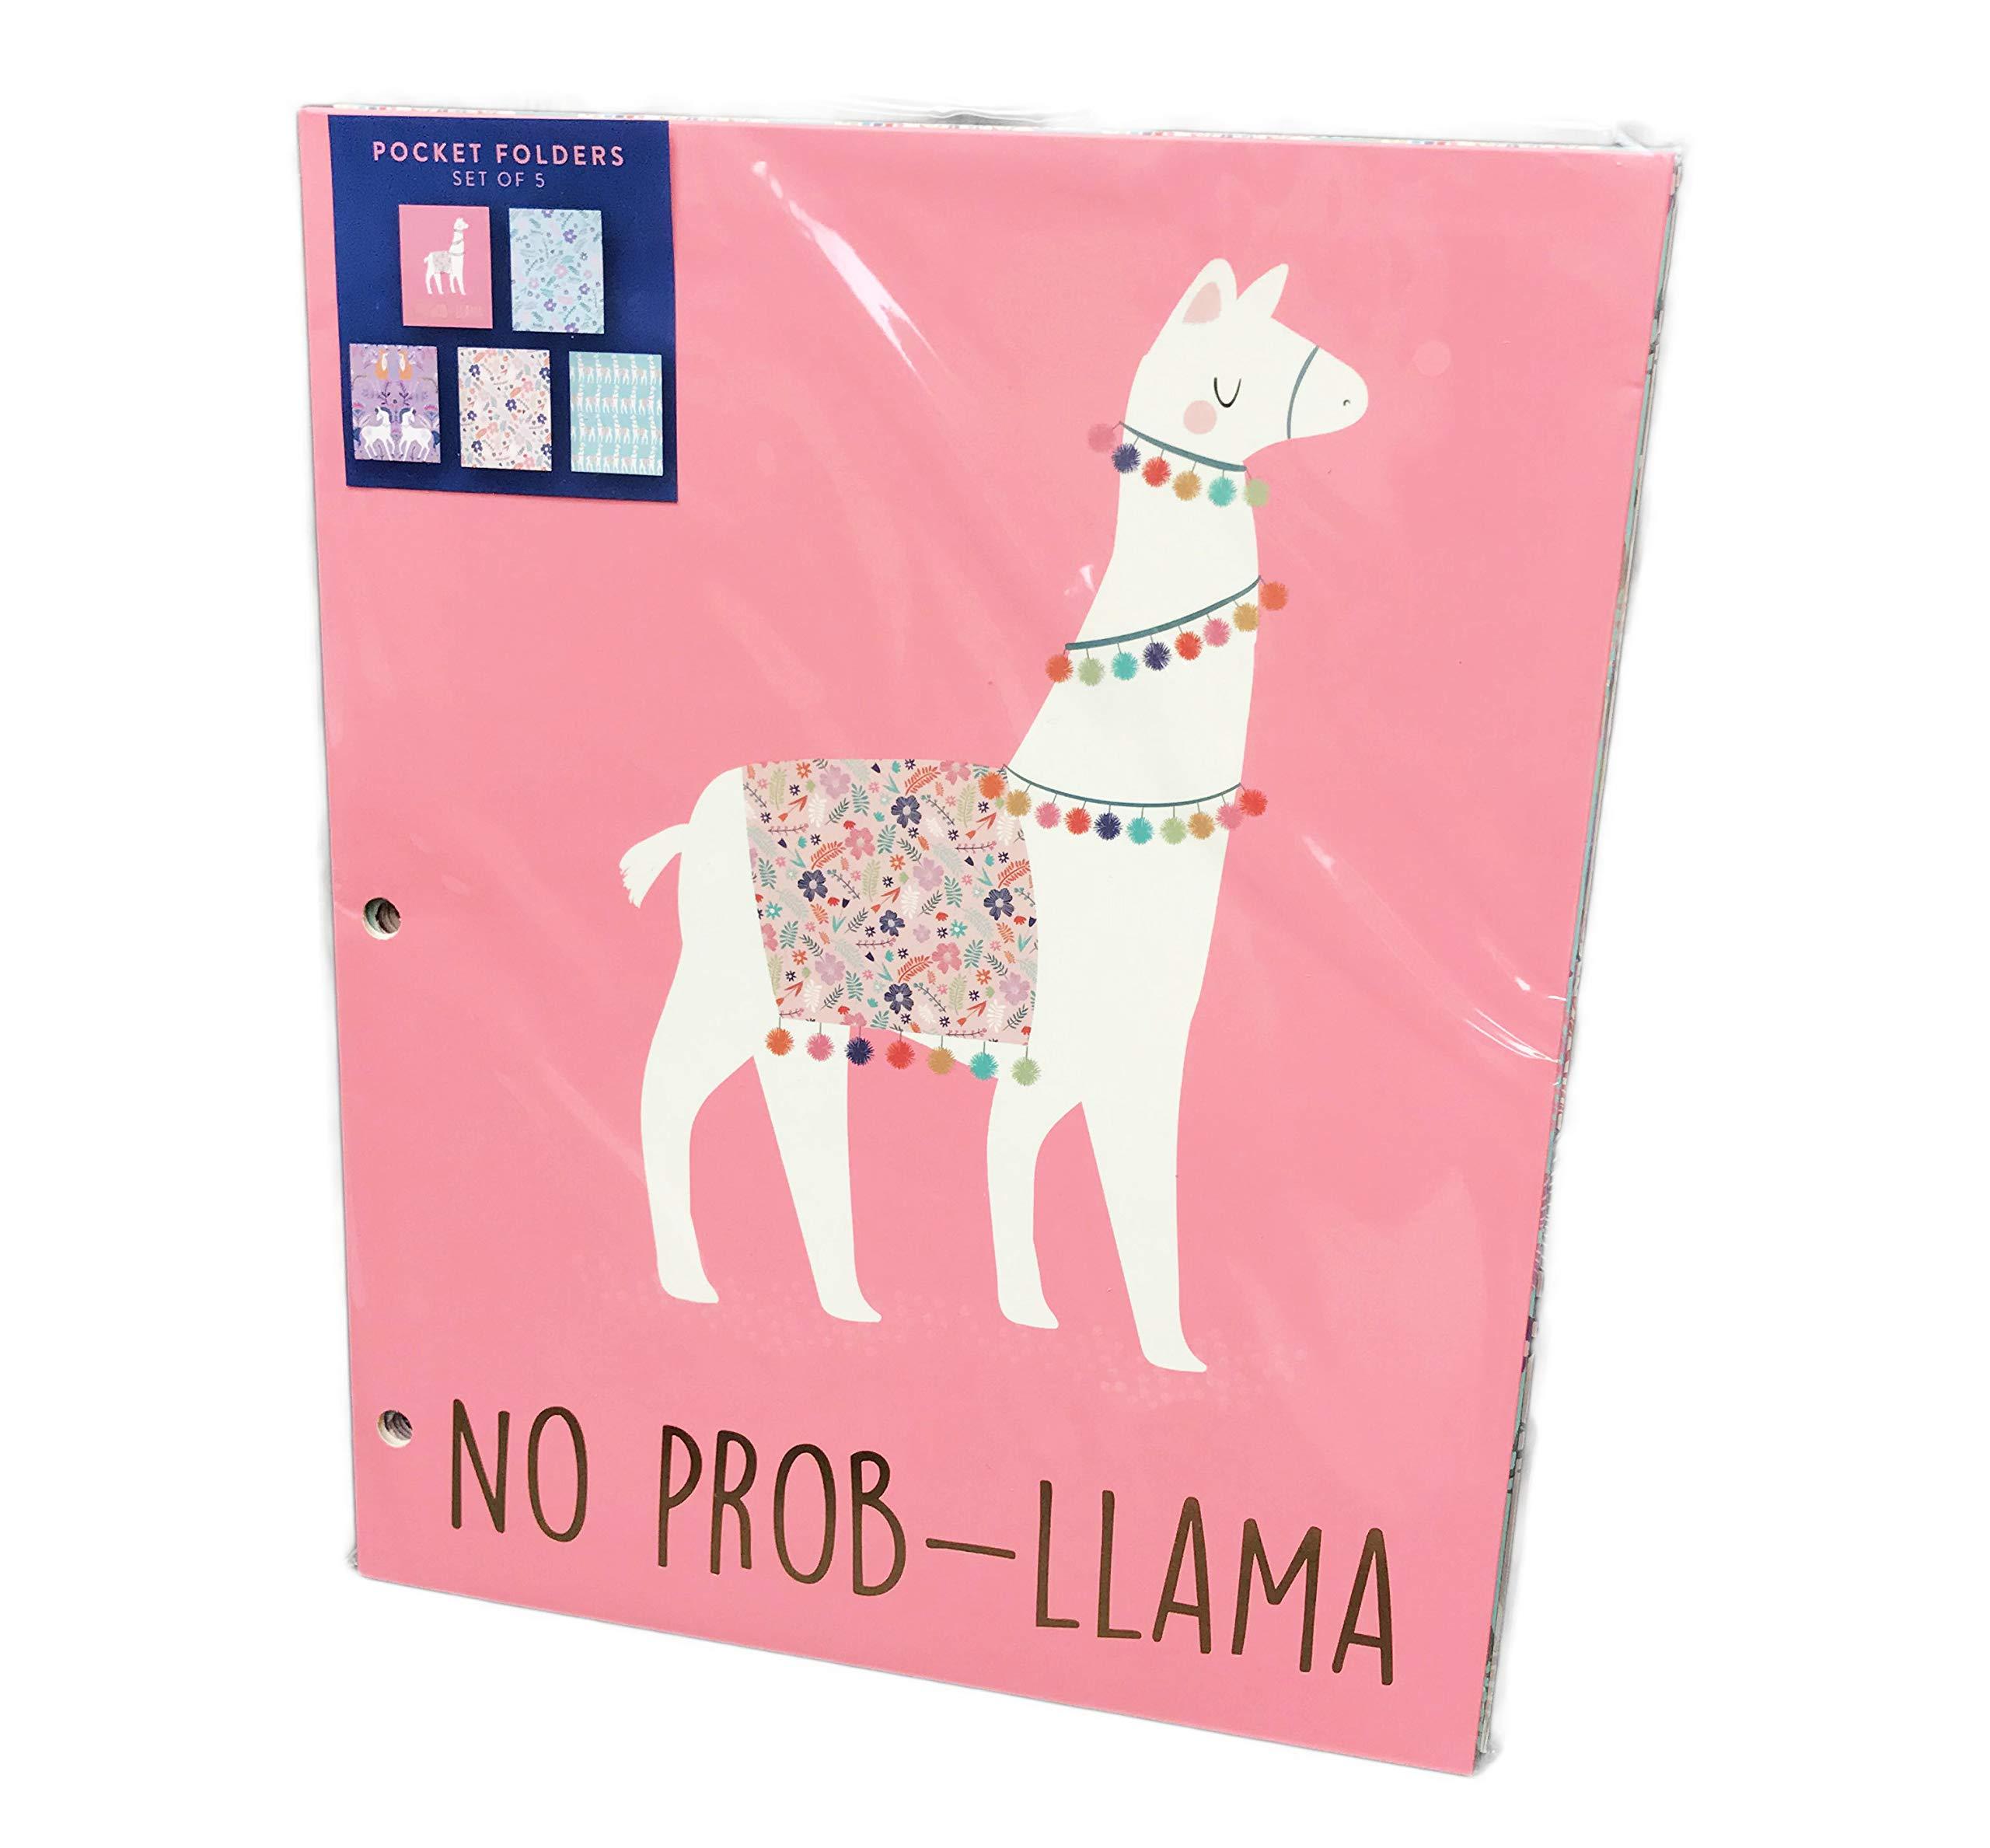 Set of 5 Colorful Llama, Floral & Unicorn Themed Novelty School Pocket Folders